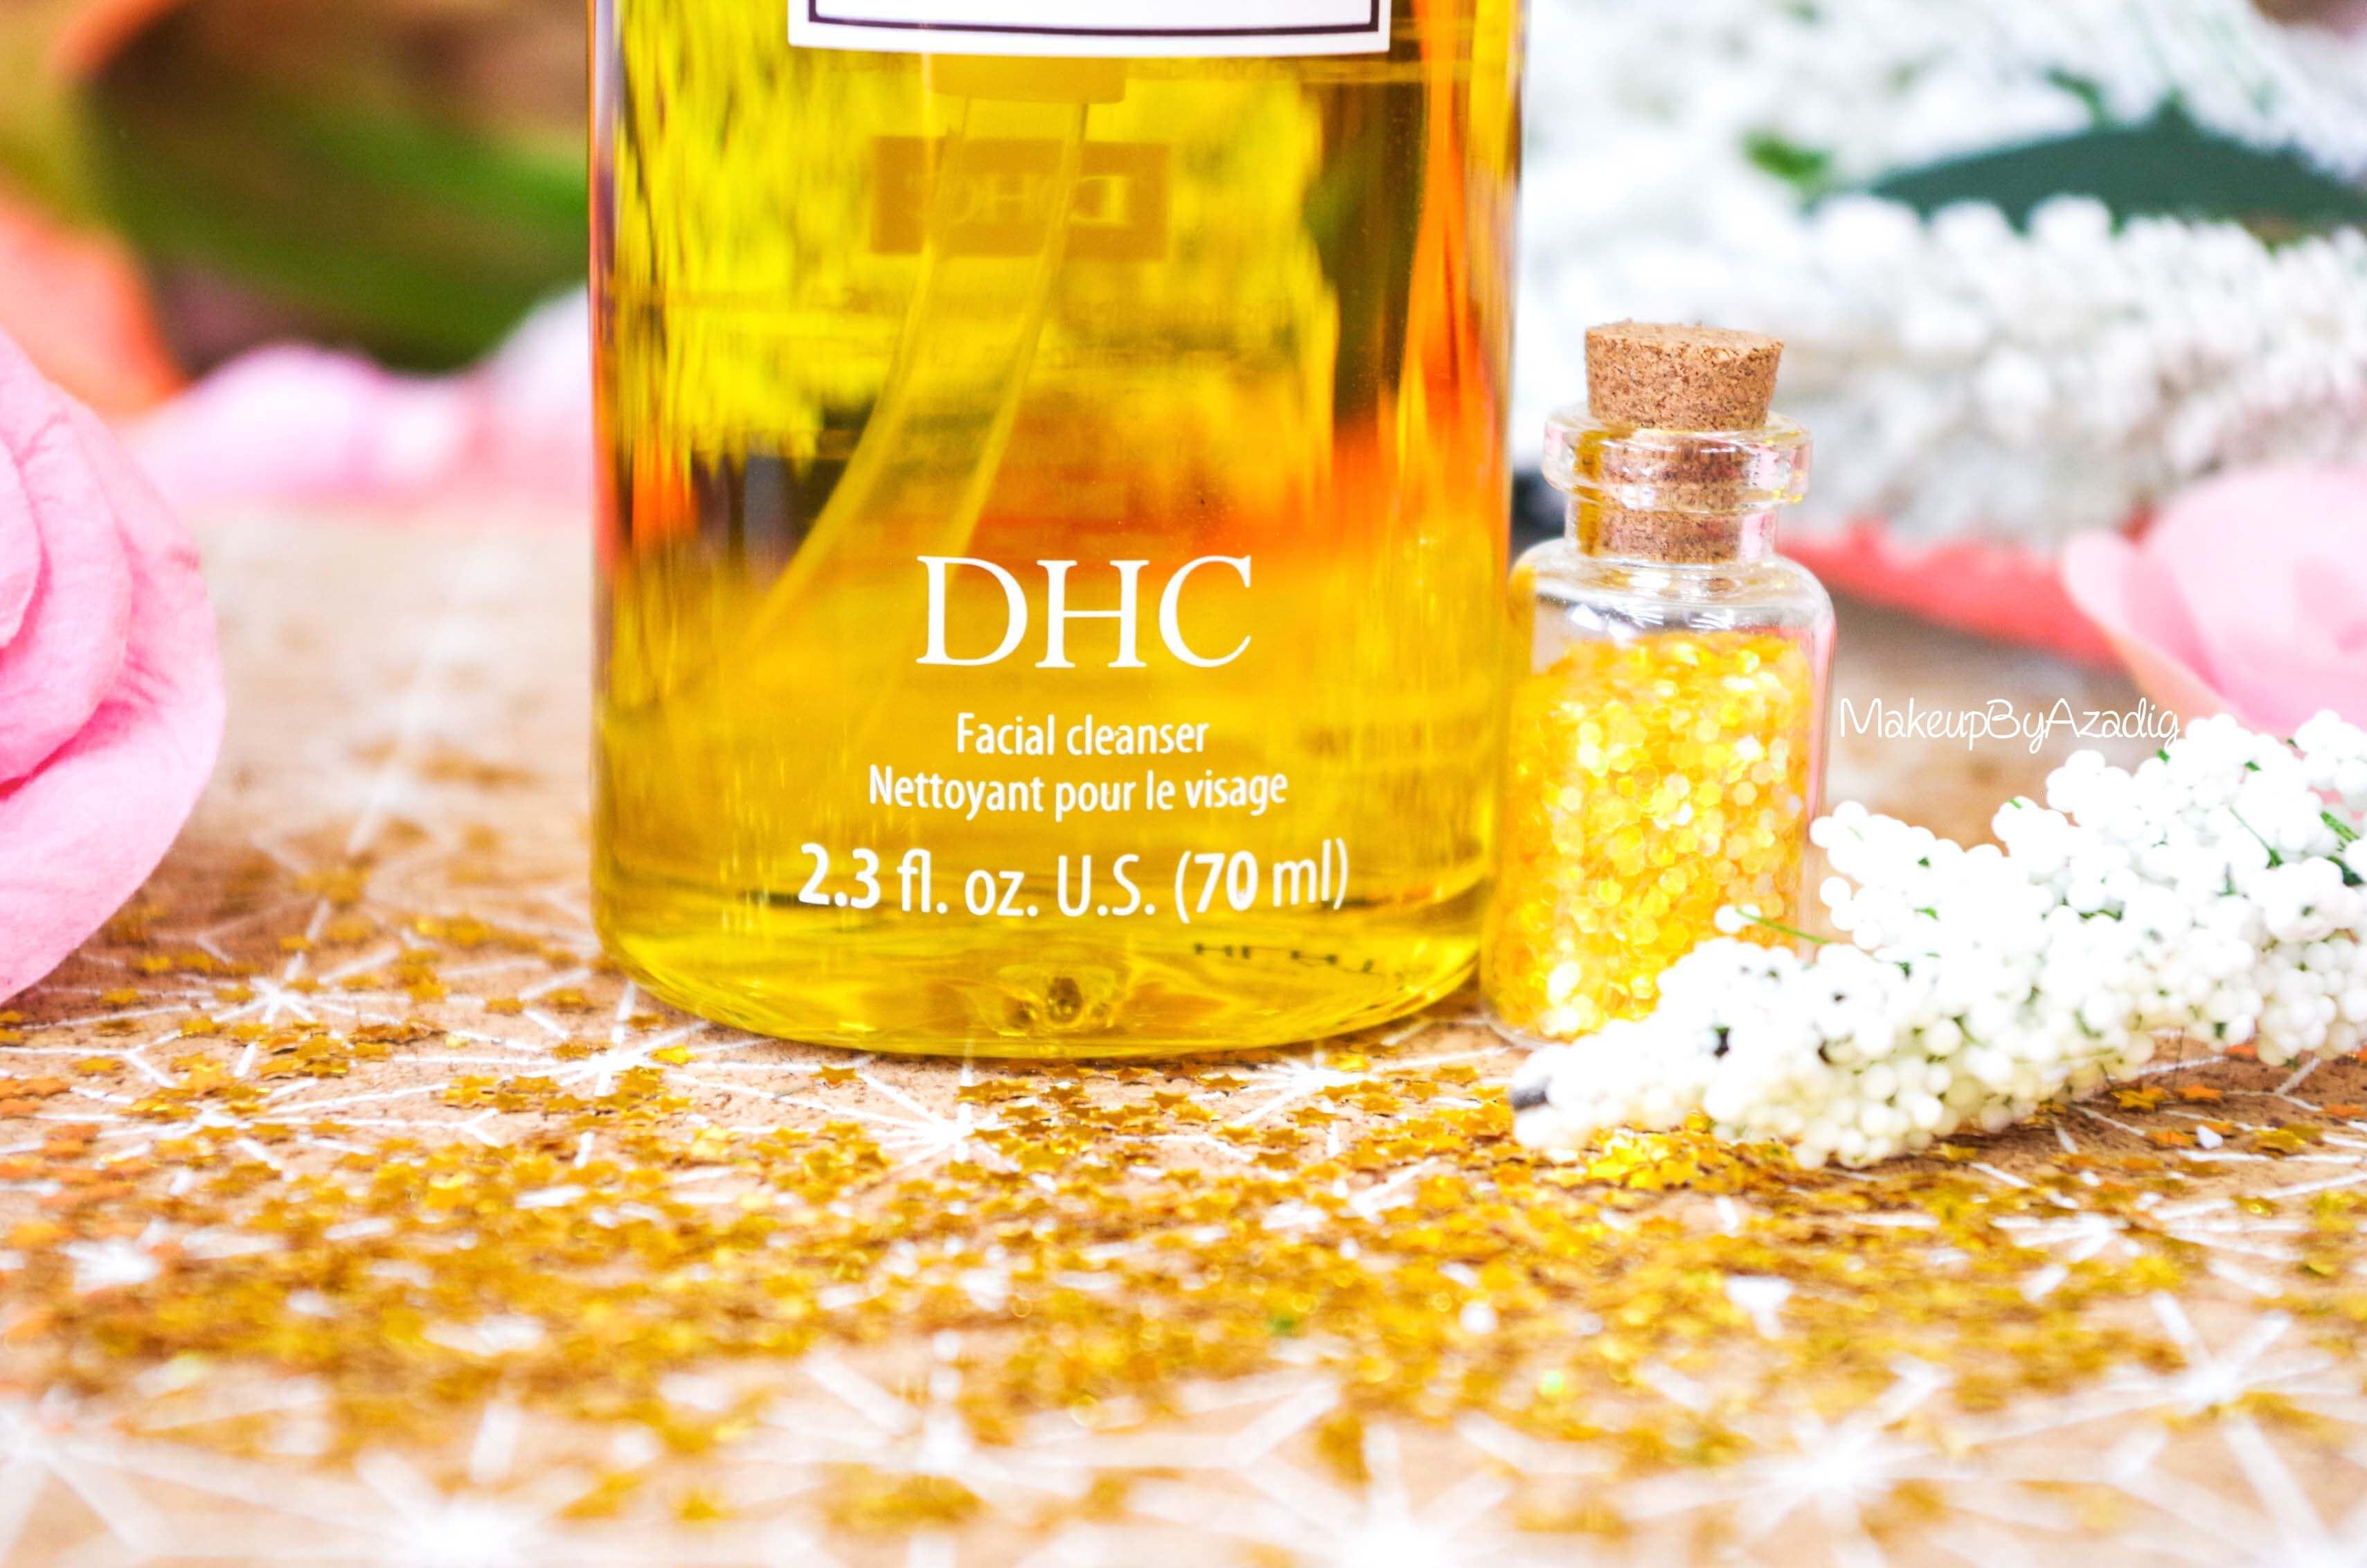 revue-review-huile-demaquillante-deep-cleansing-oil-dhc-meilleure-avis-prix-nocibe-monoprix-makeupbyazadig-contenu